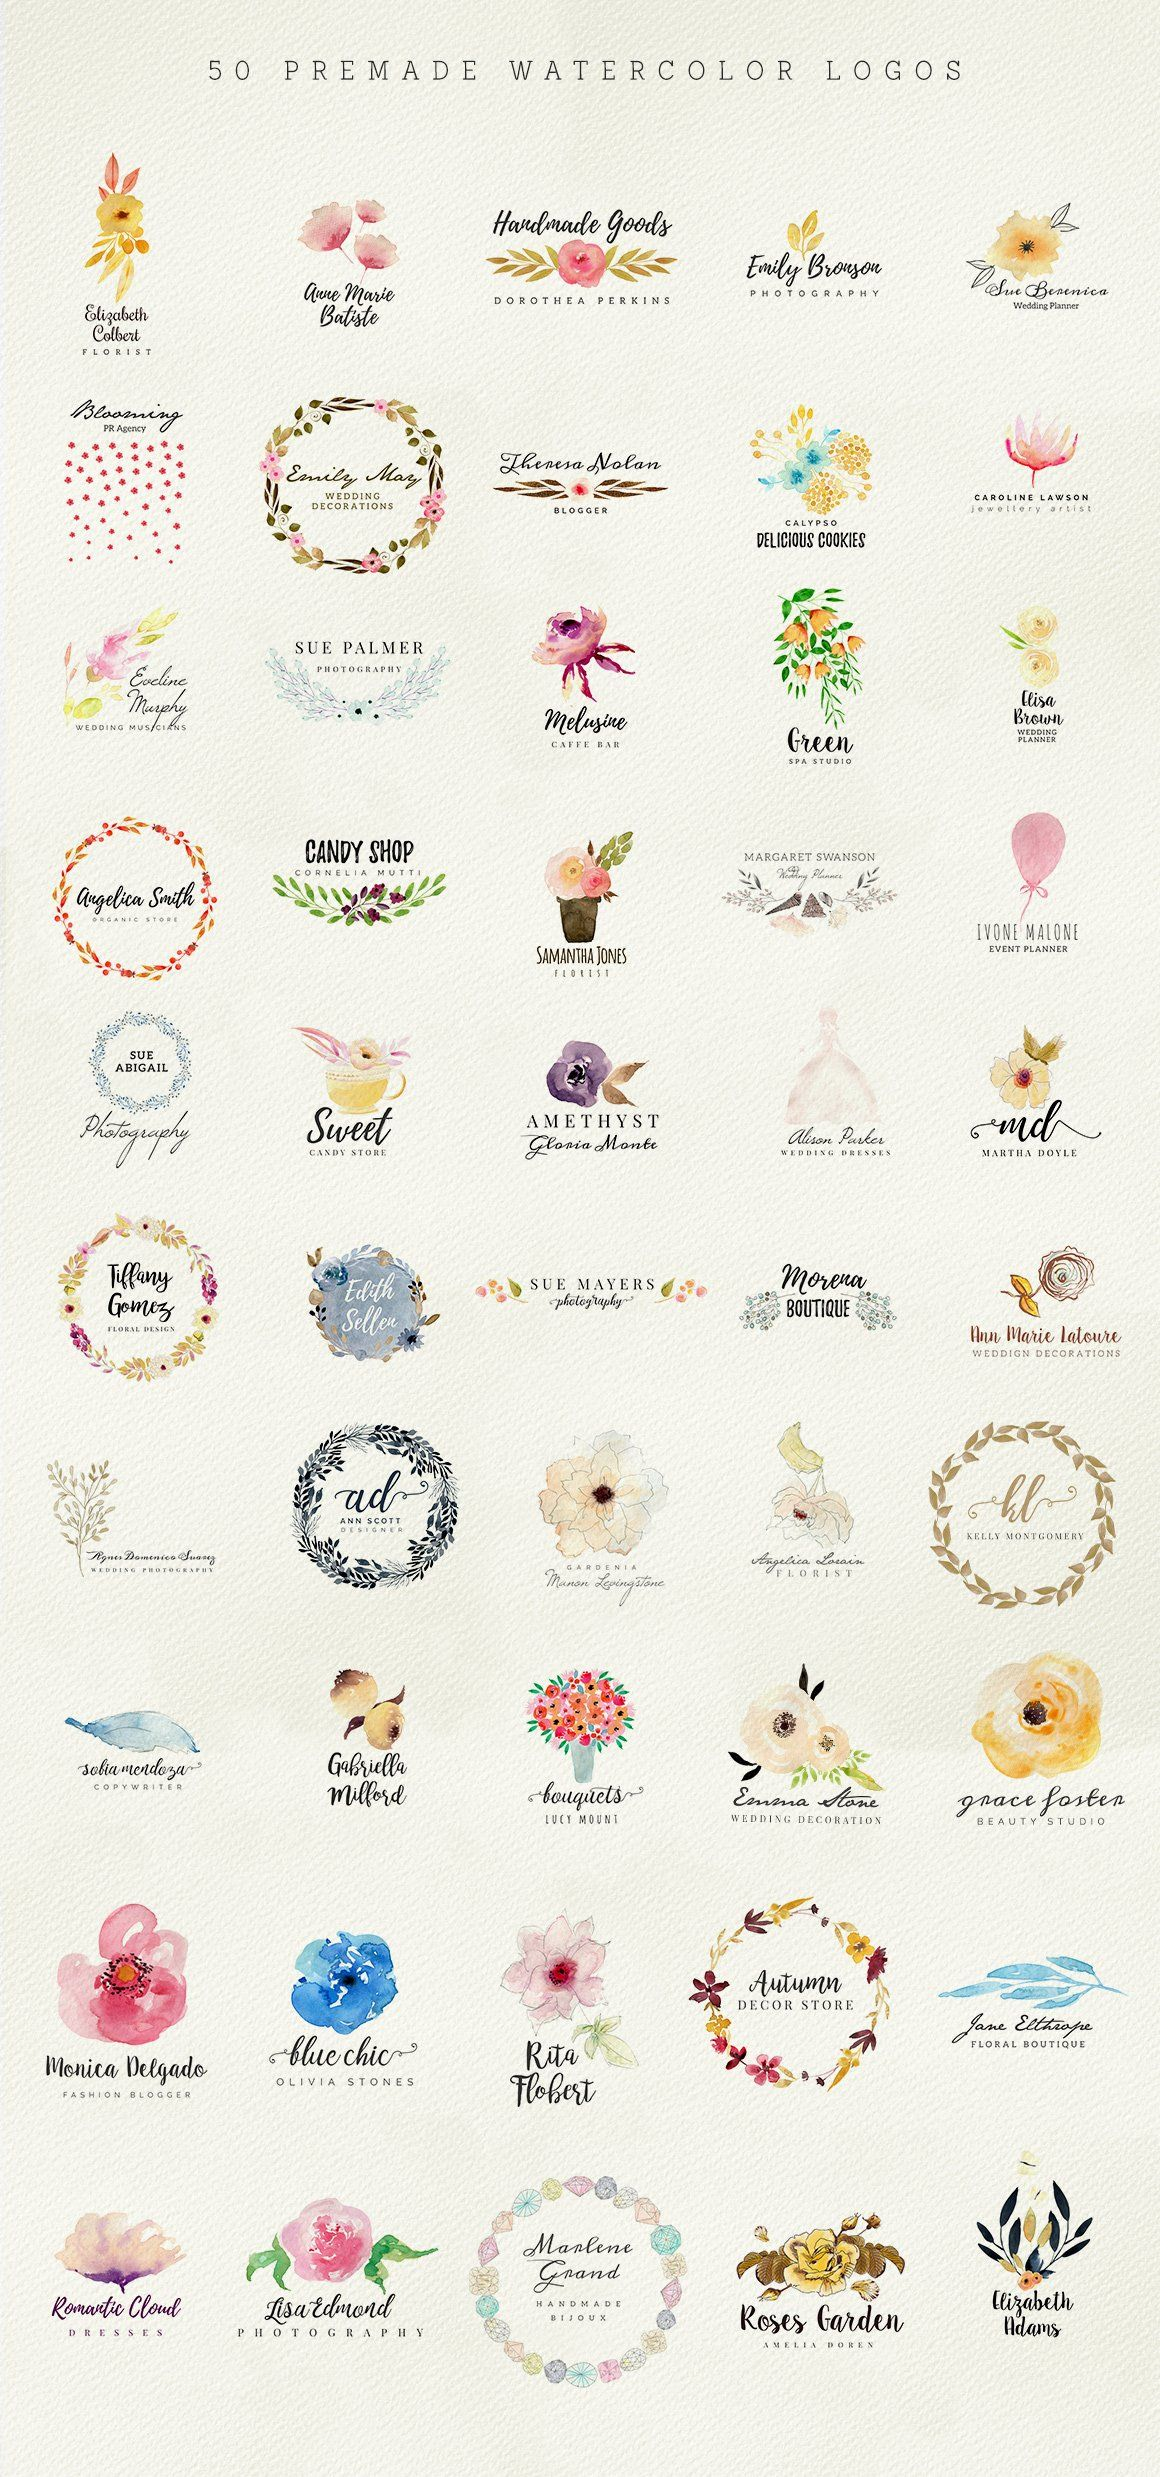 50 Premade Watercolor Logos Watercolor logo, Floral logo